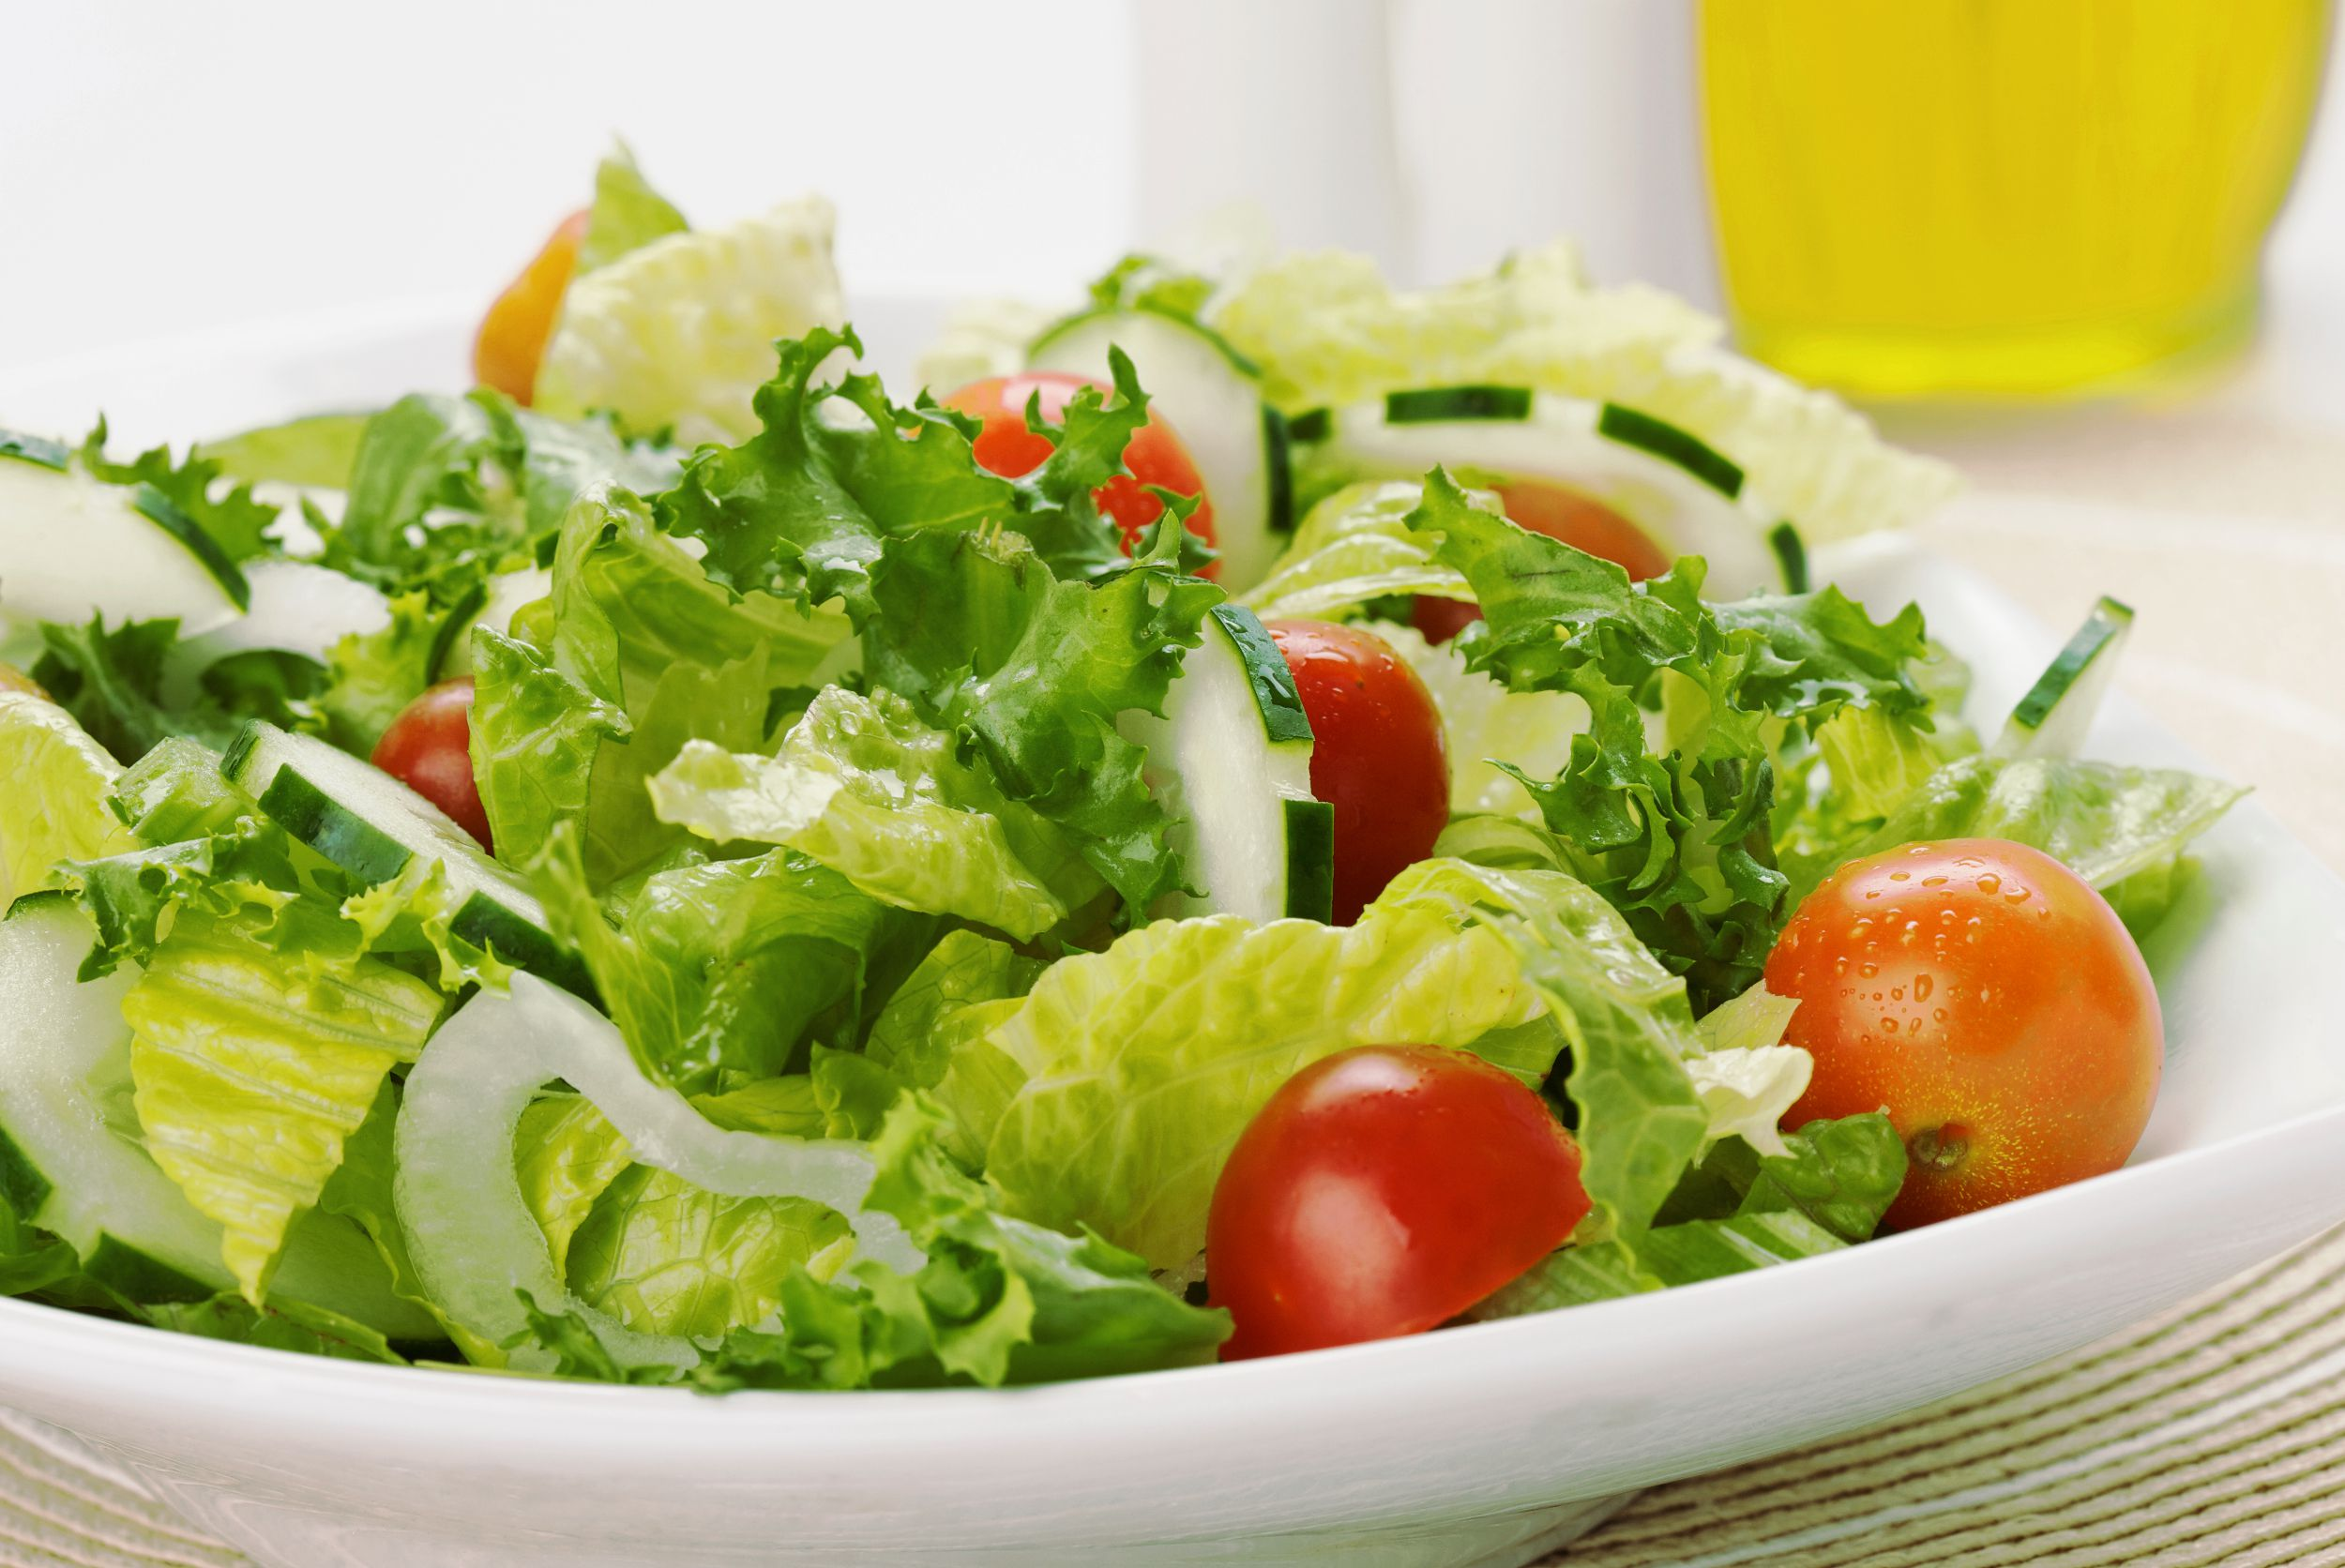 Making the Perfect Green Salad: A Basic Formula